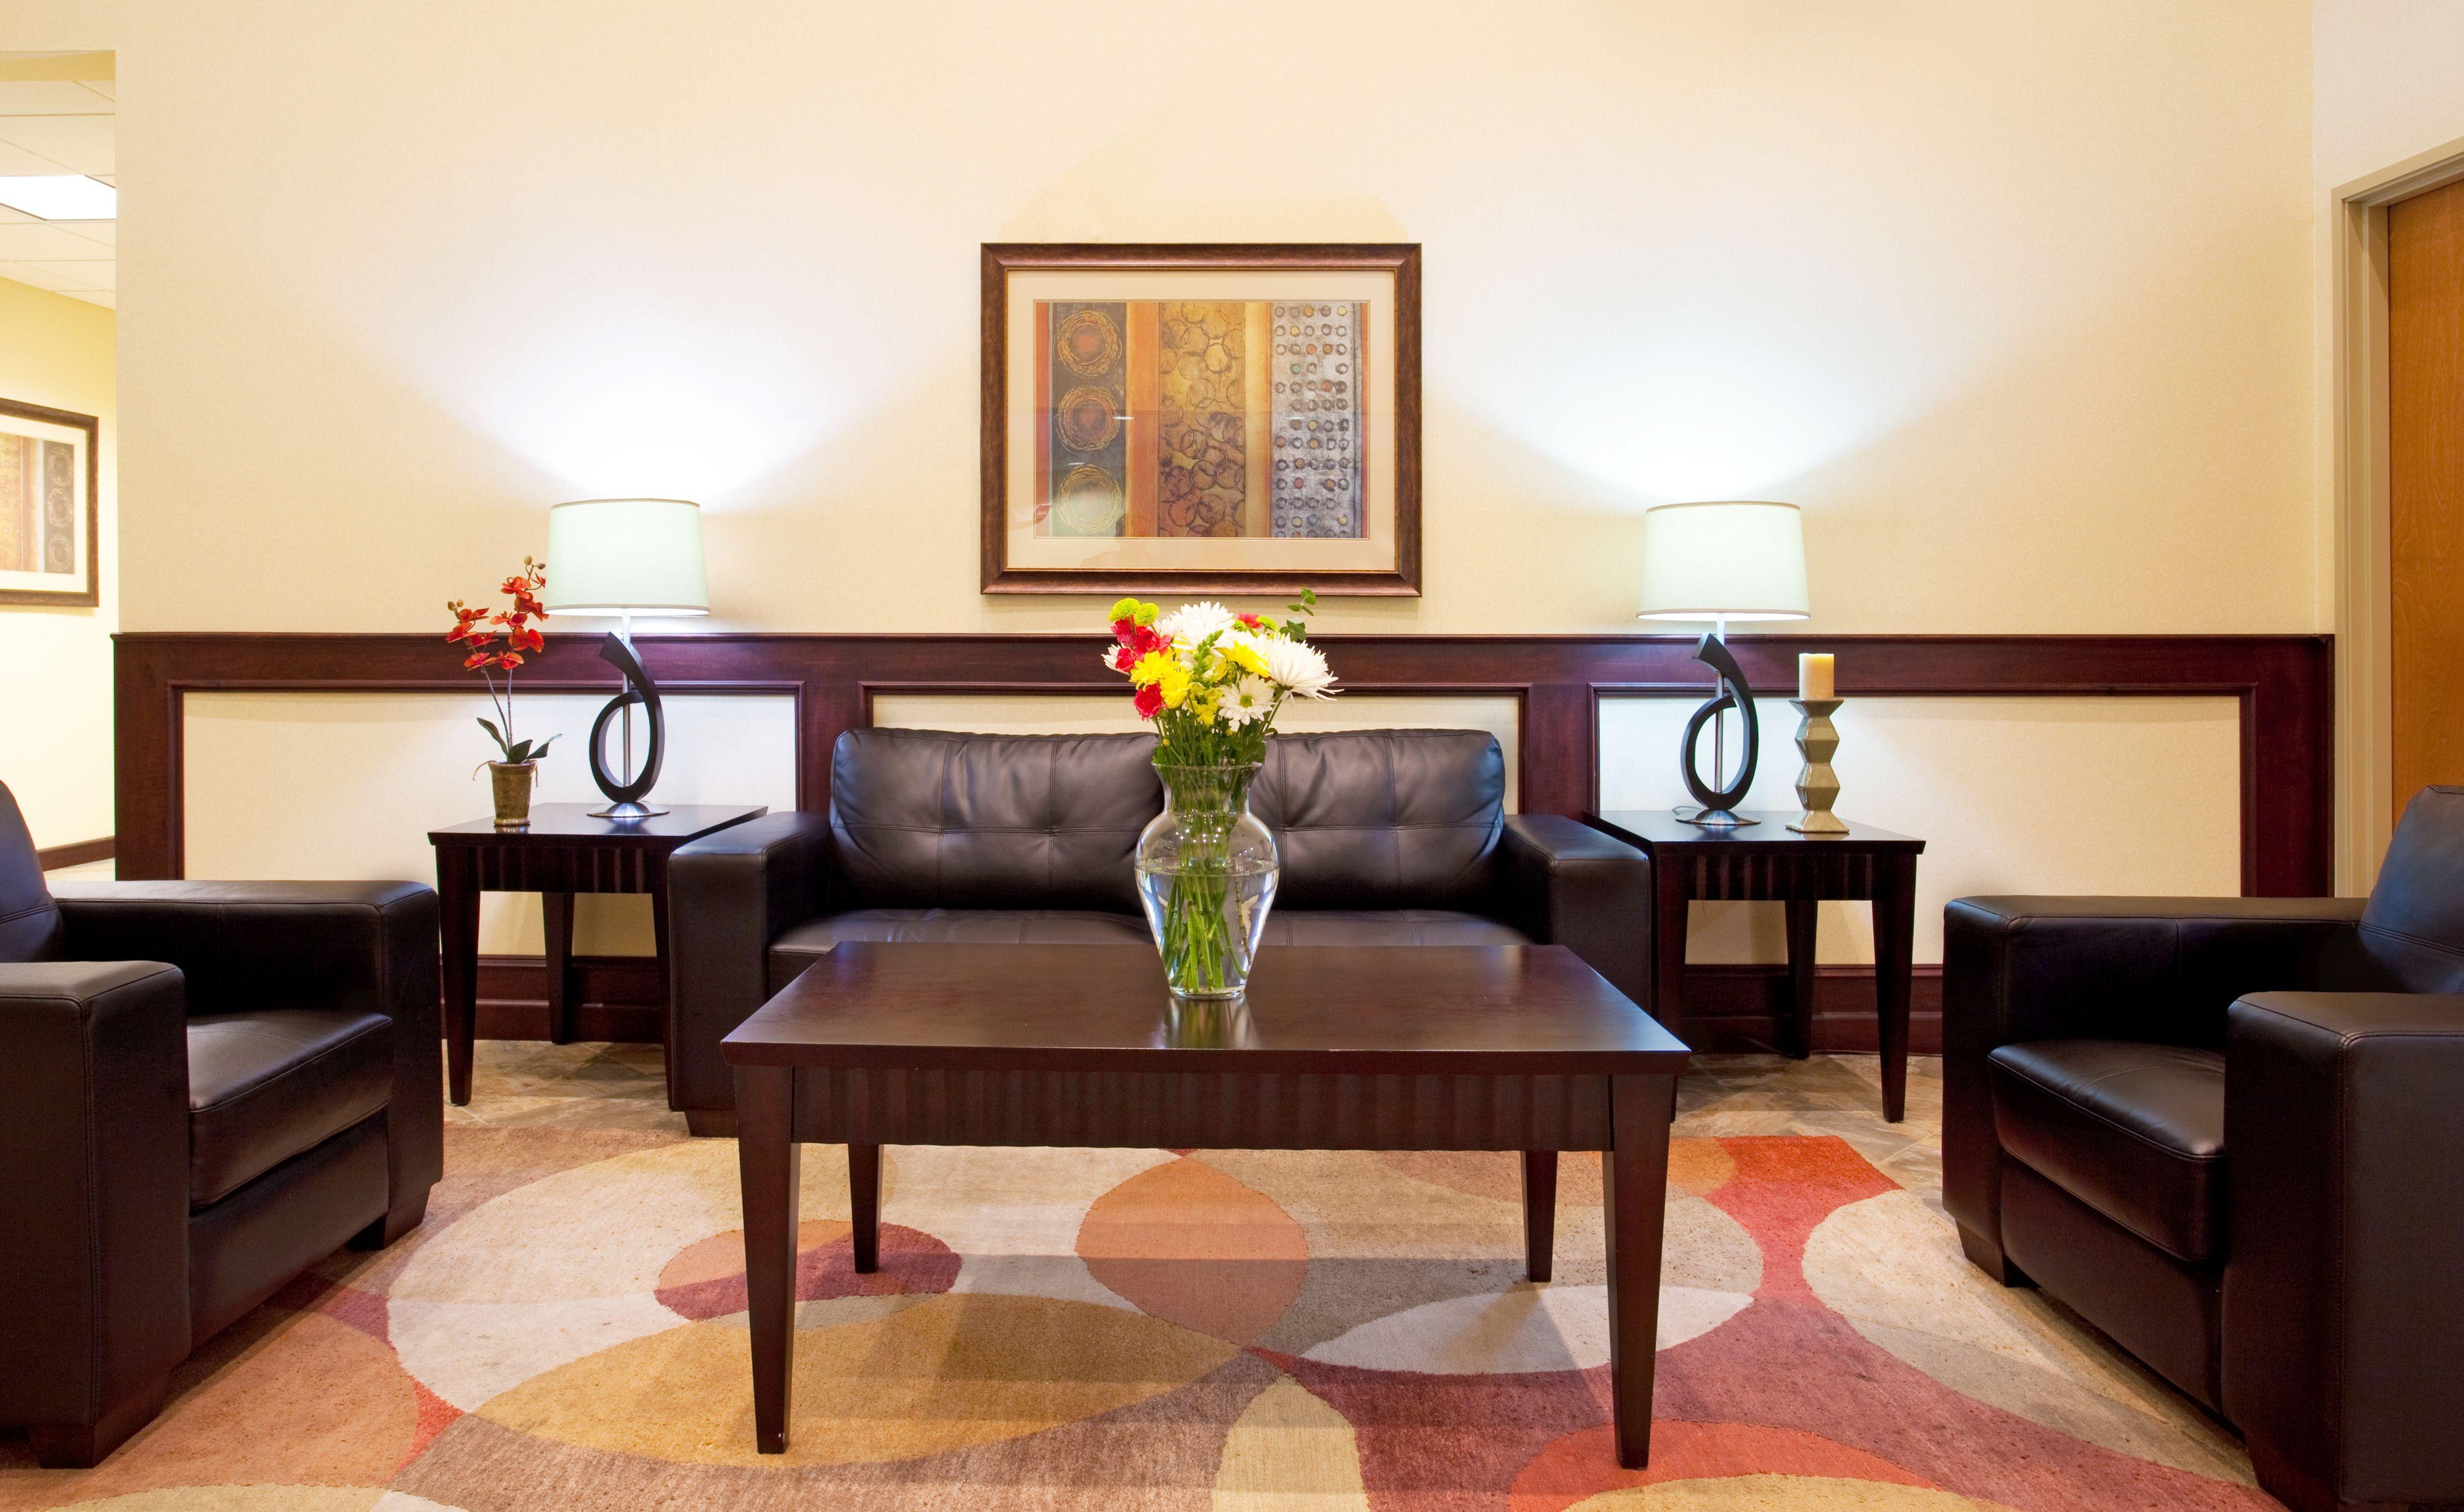 Holiday Inn Express & Suites Chicago North-Waukegan-Gurnee image 4